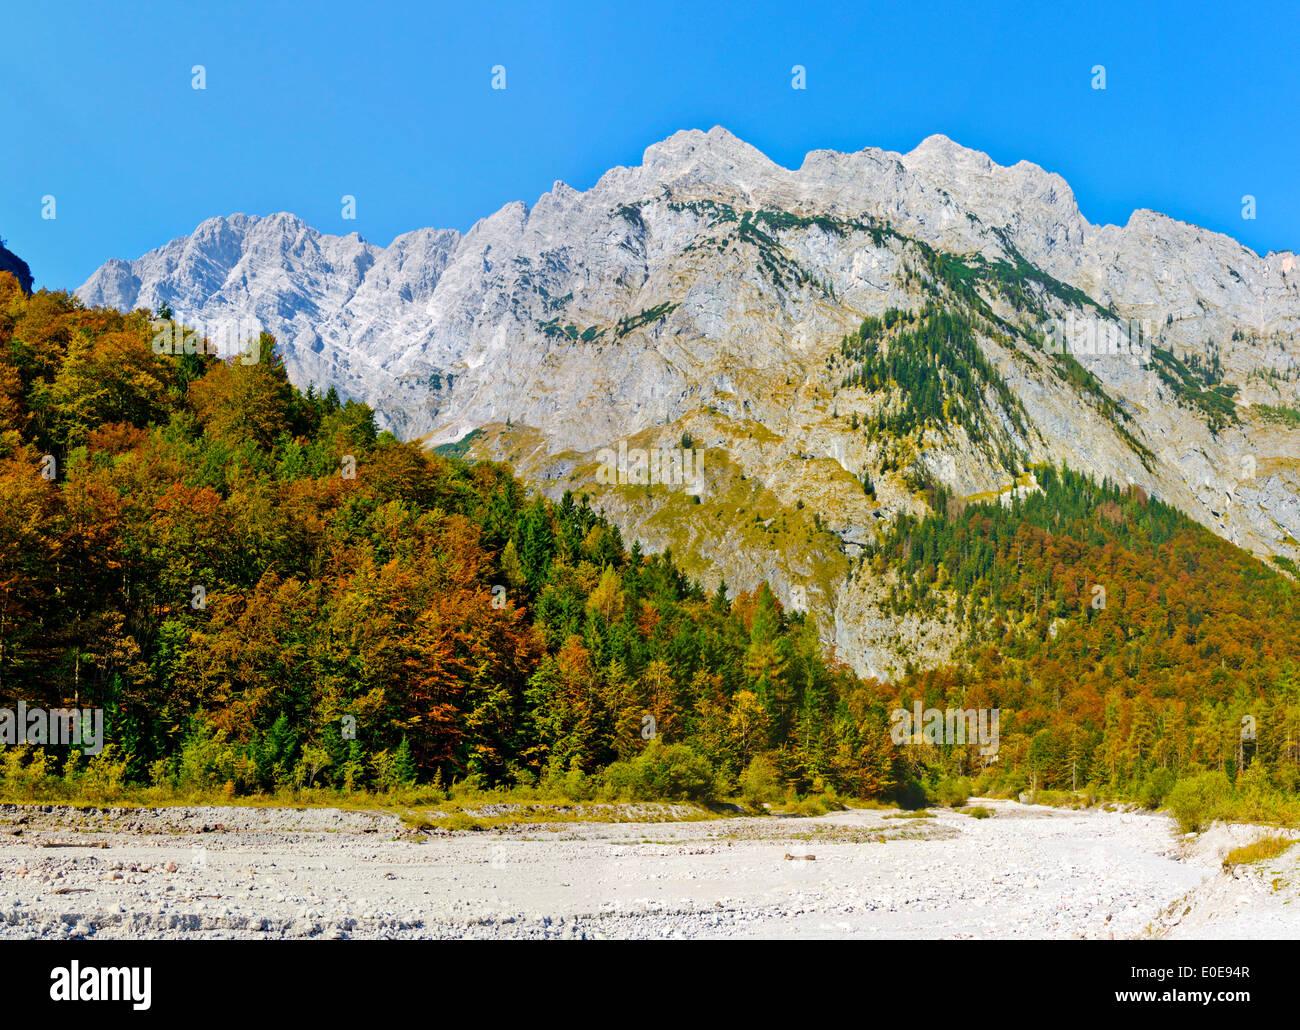 Watzmann Koenigssee in the Berchtesgaden region South Germany nice weather east wall travel destinati valley of Eisbach - Stock Image